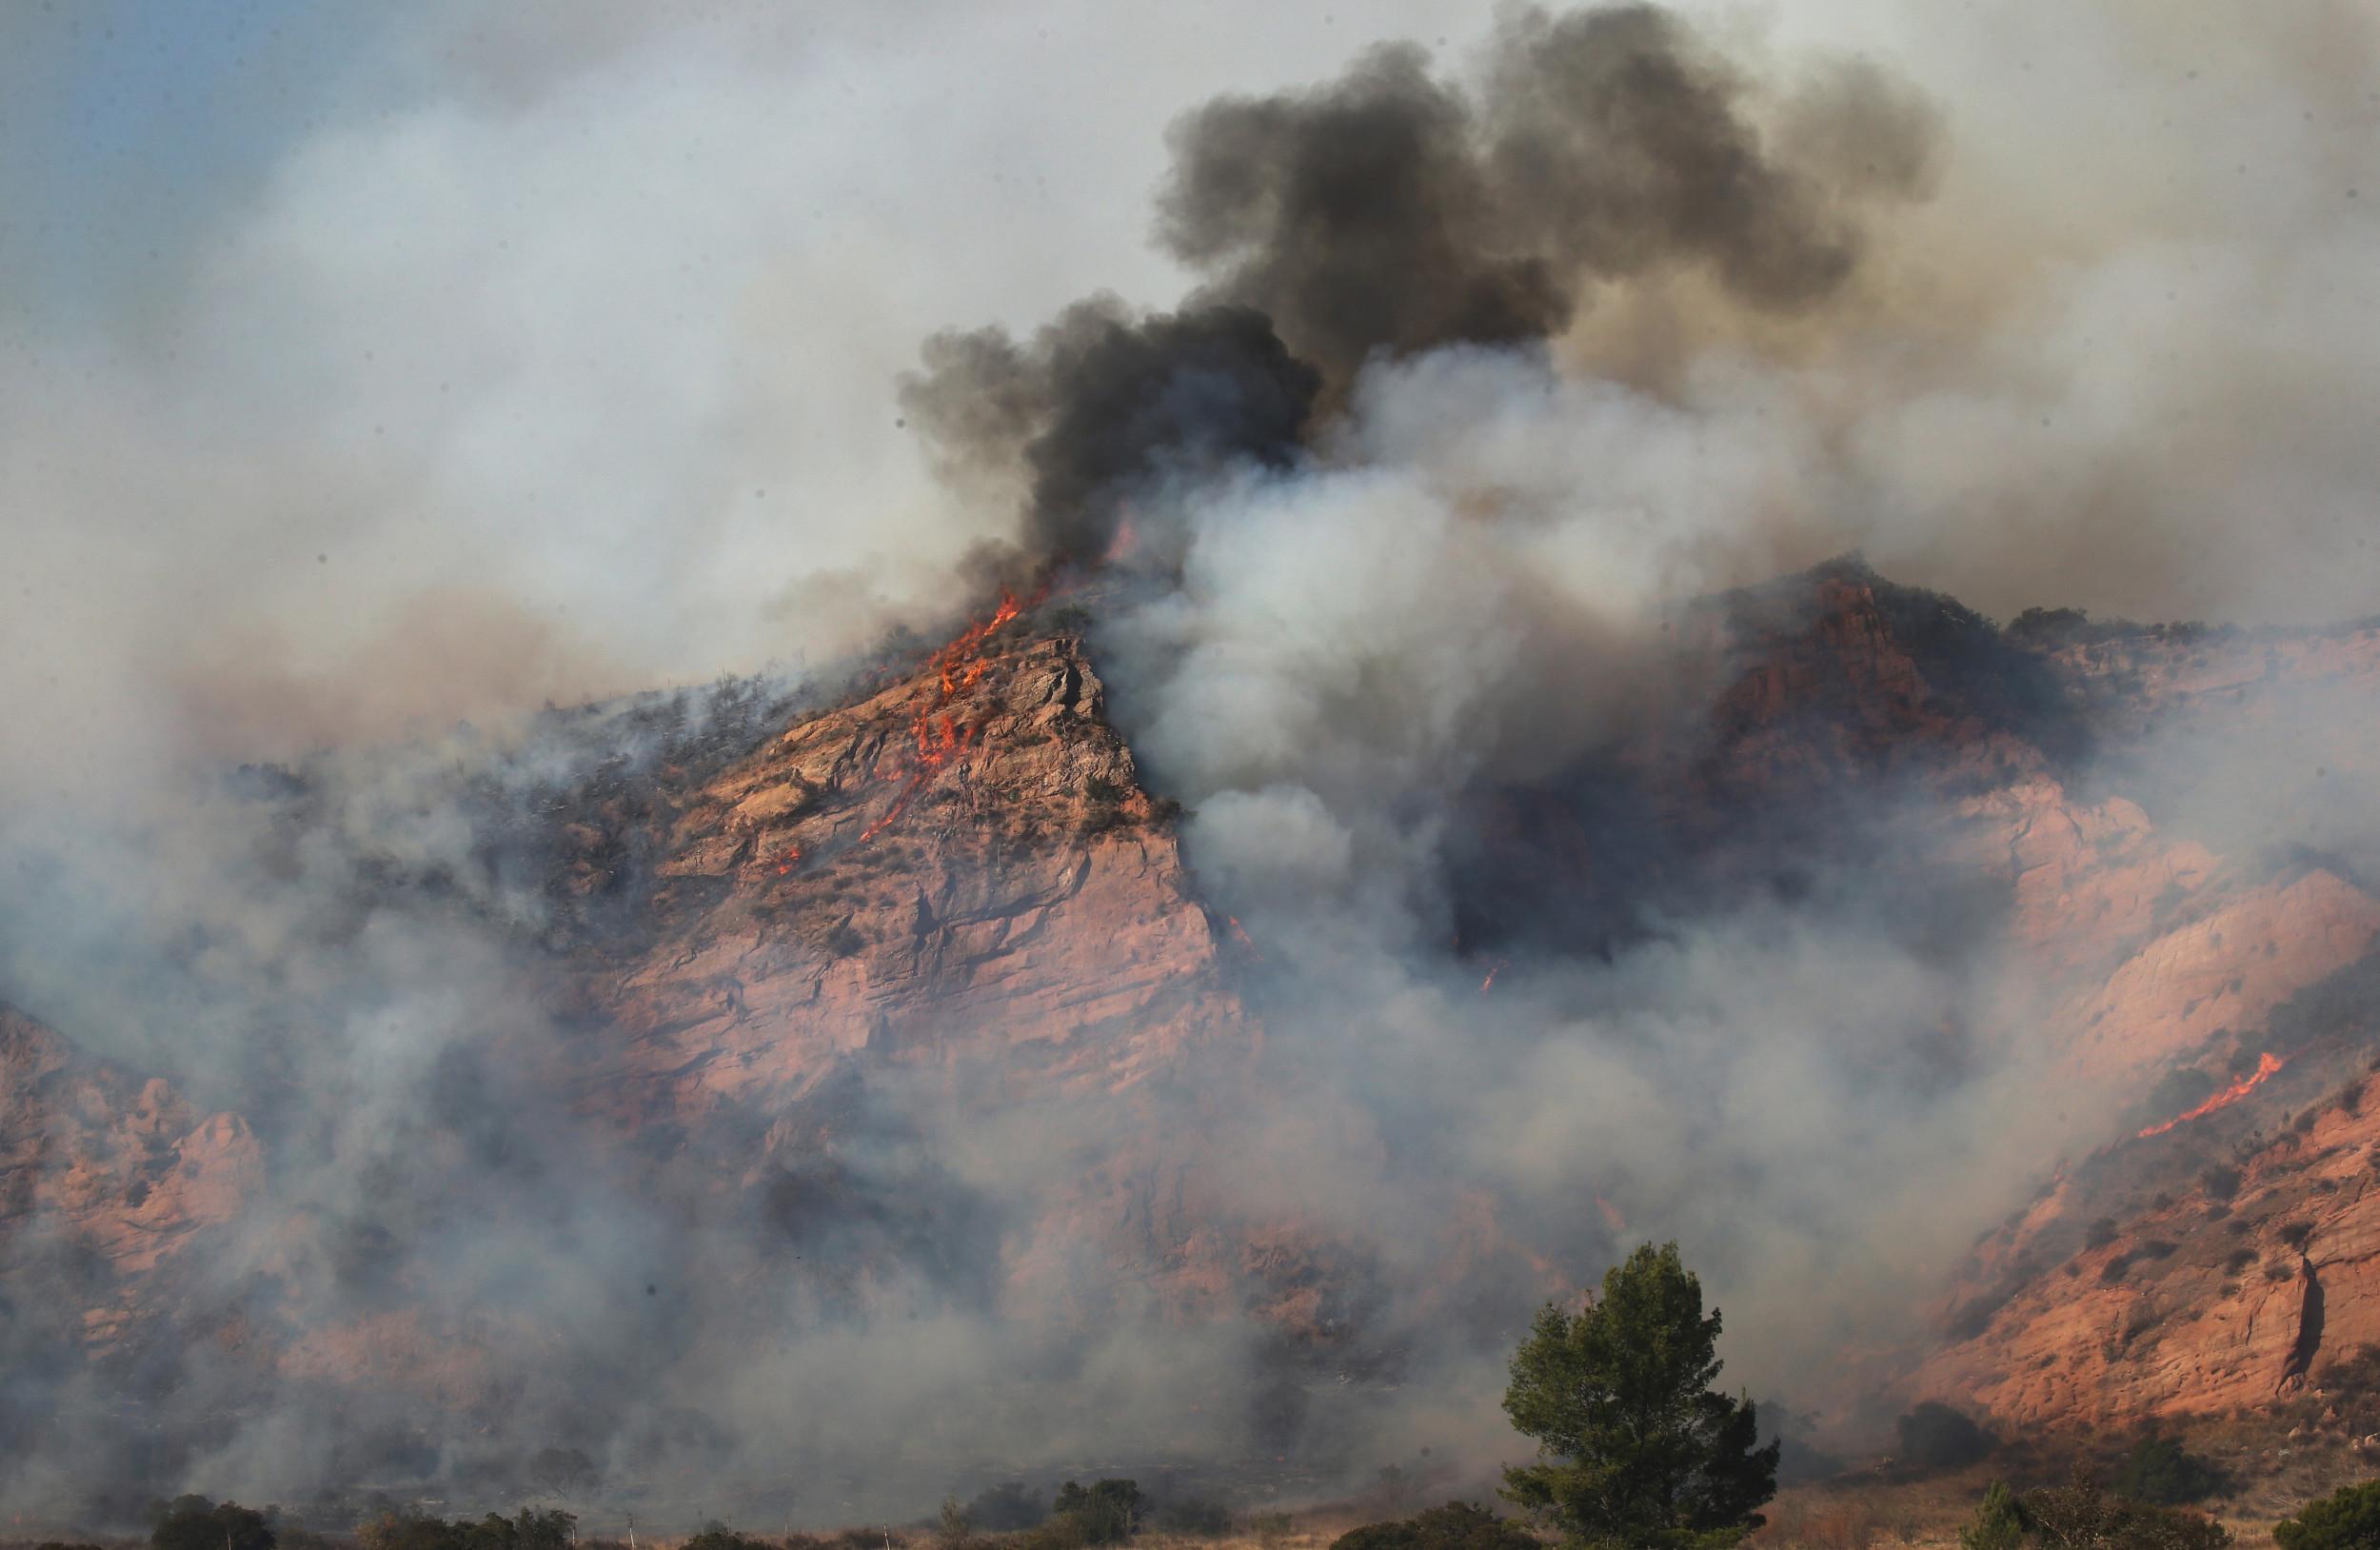 California fire map, updates, Bond Fire sparks mass vacuation of Silverado Canyon